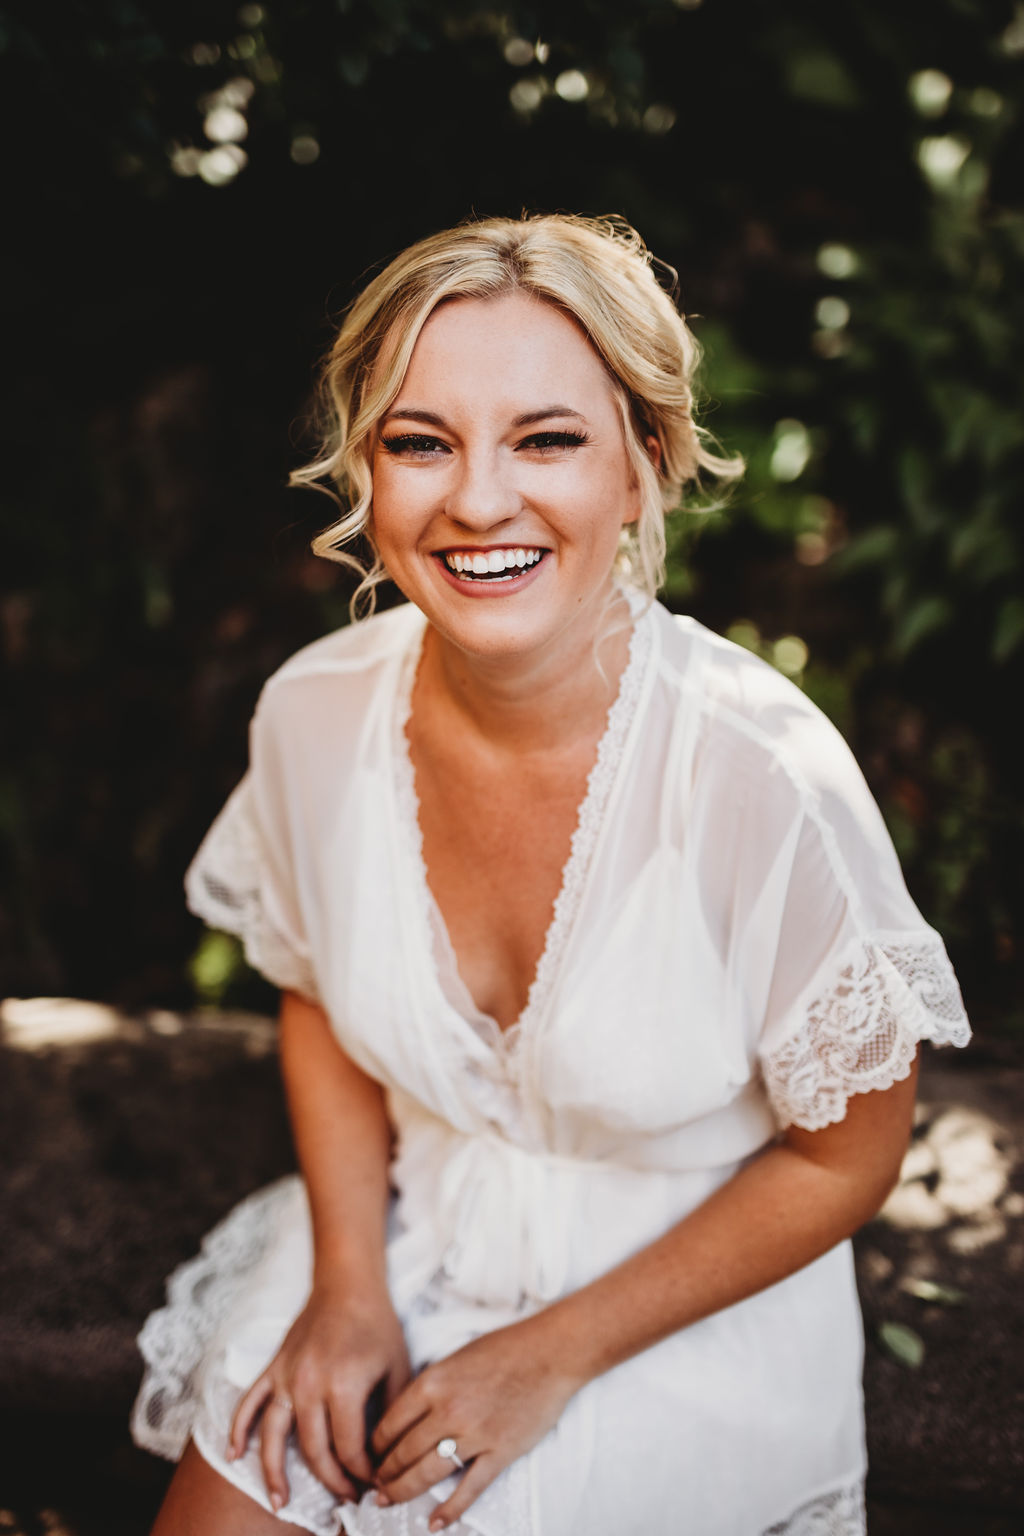 engle-olson-katie-dalton-wedding-clewell-photography-3.jpg